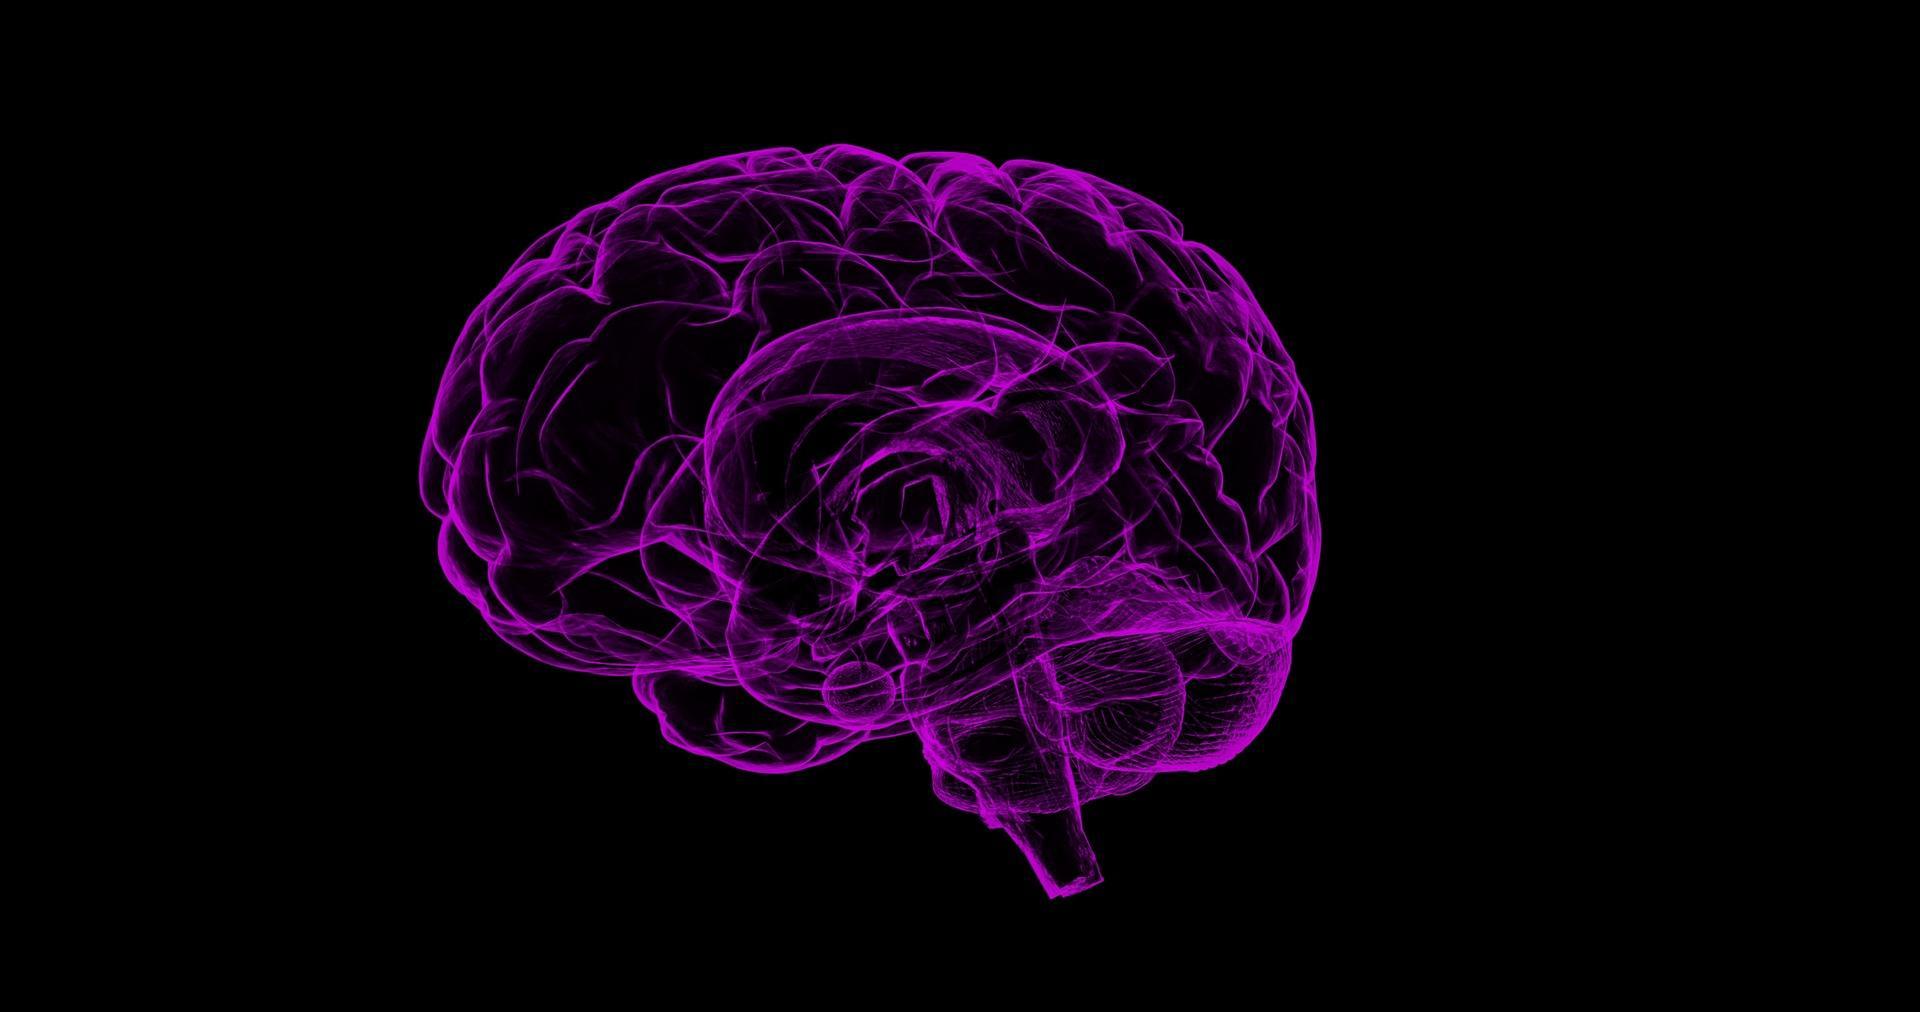 neon purple outline of brain on black background